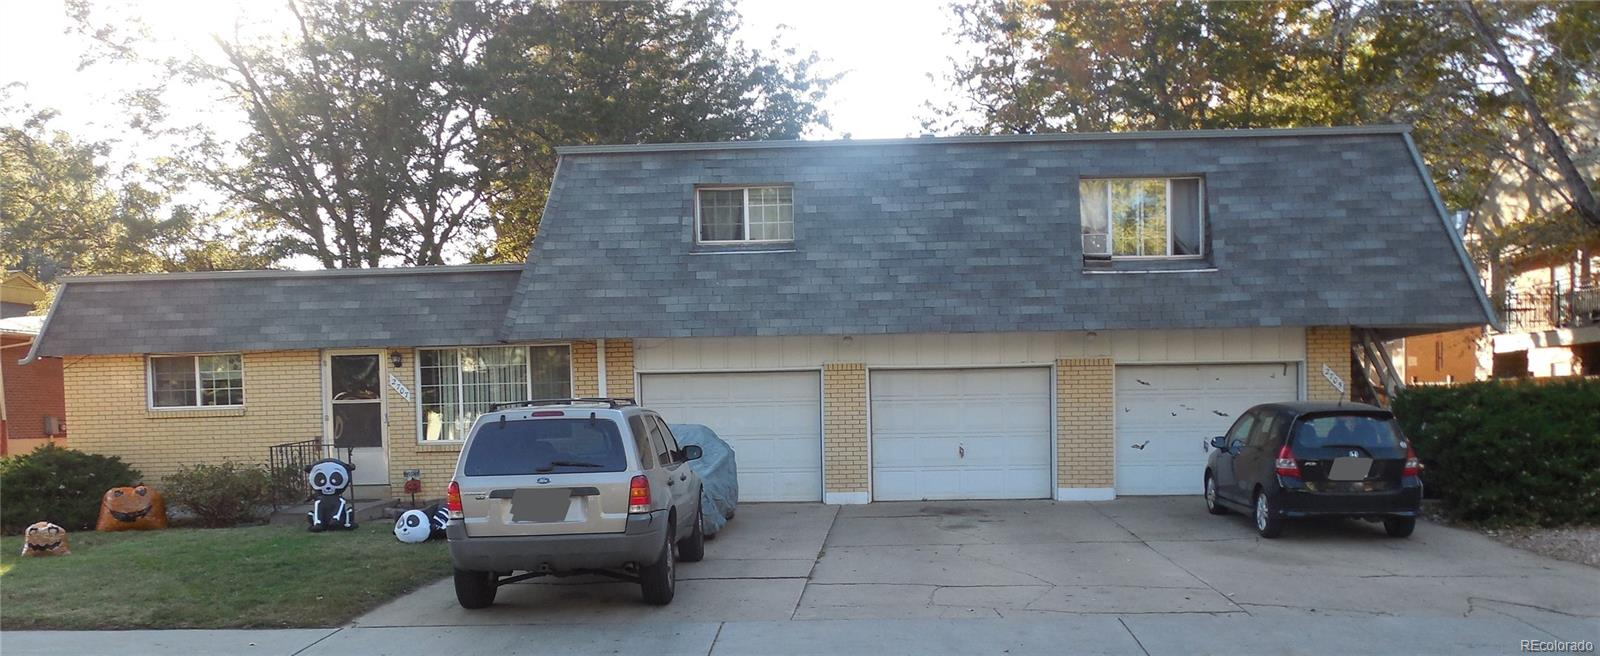 2703 Stanford Road, Fort Collins, CO 80525 - Fort Collins, CO real estate listing